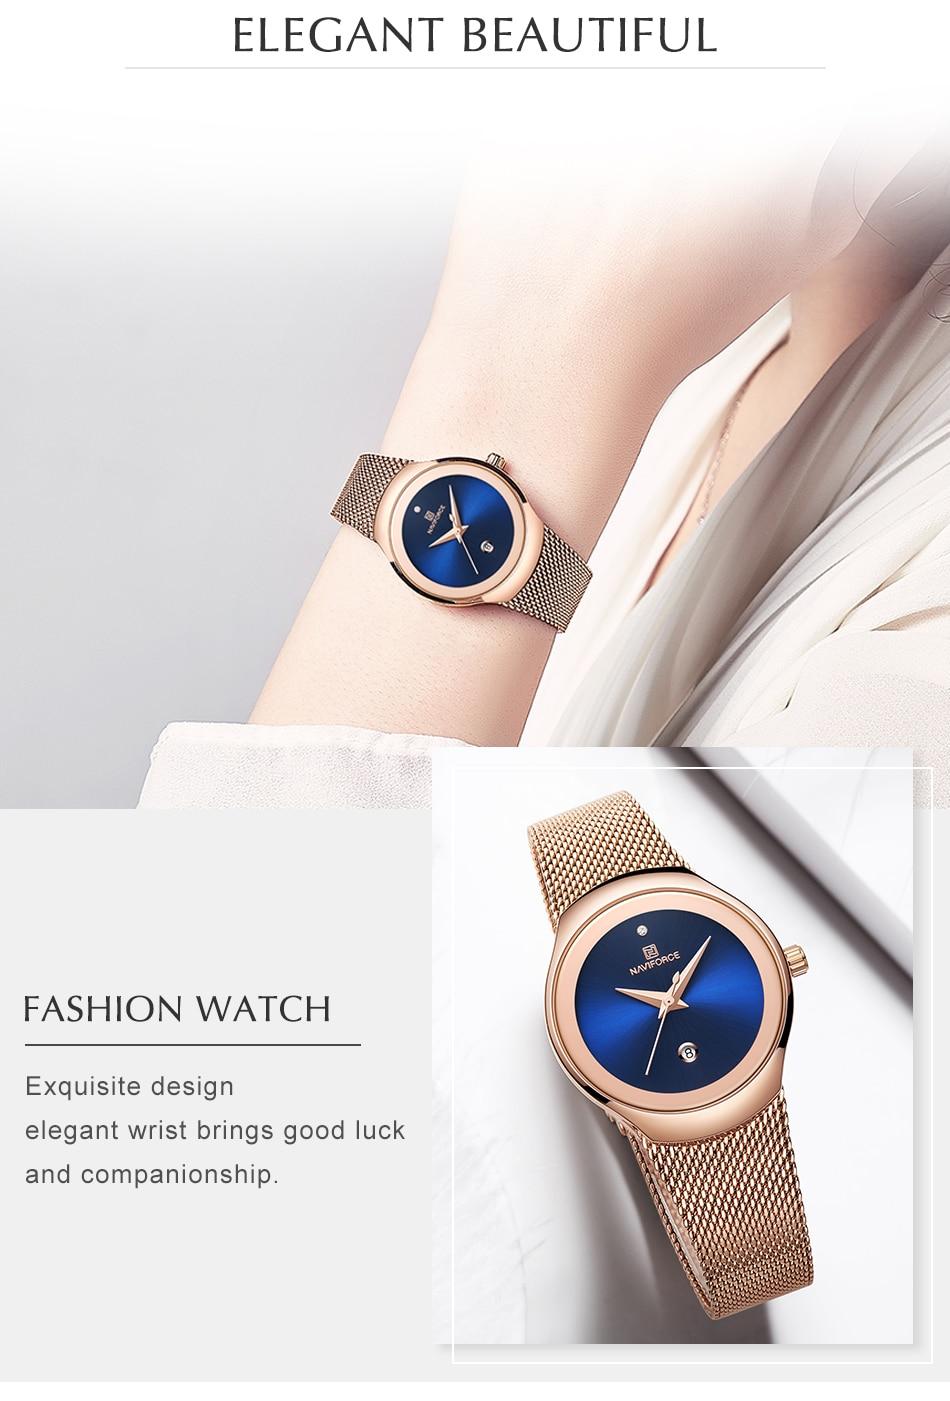 NAVIFORCE Top Luxury Brand Women Watches Female Fashion Simple Quartz Watch Ladies Classic Stainless Steel Mesh Belt Wrist Watch 6